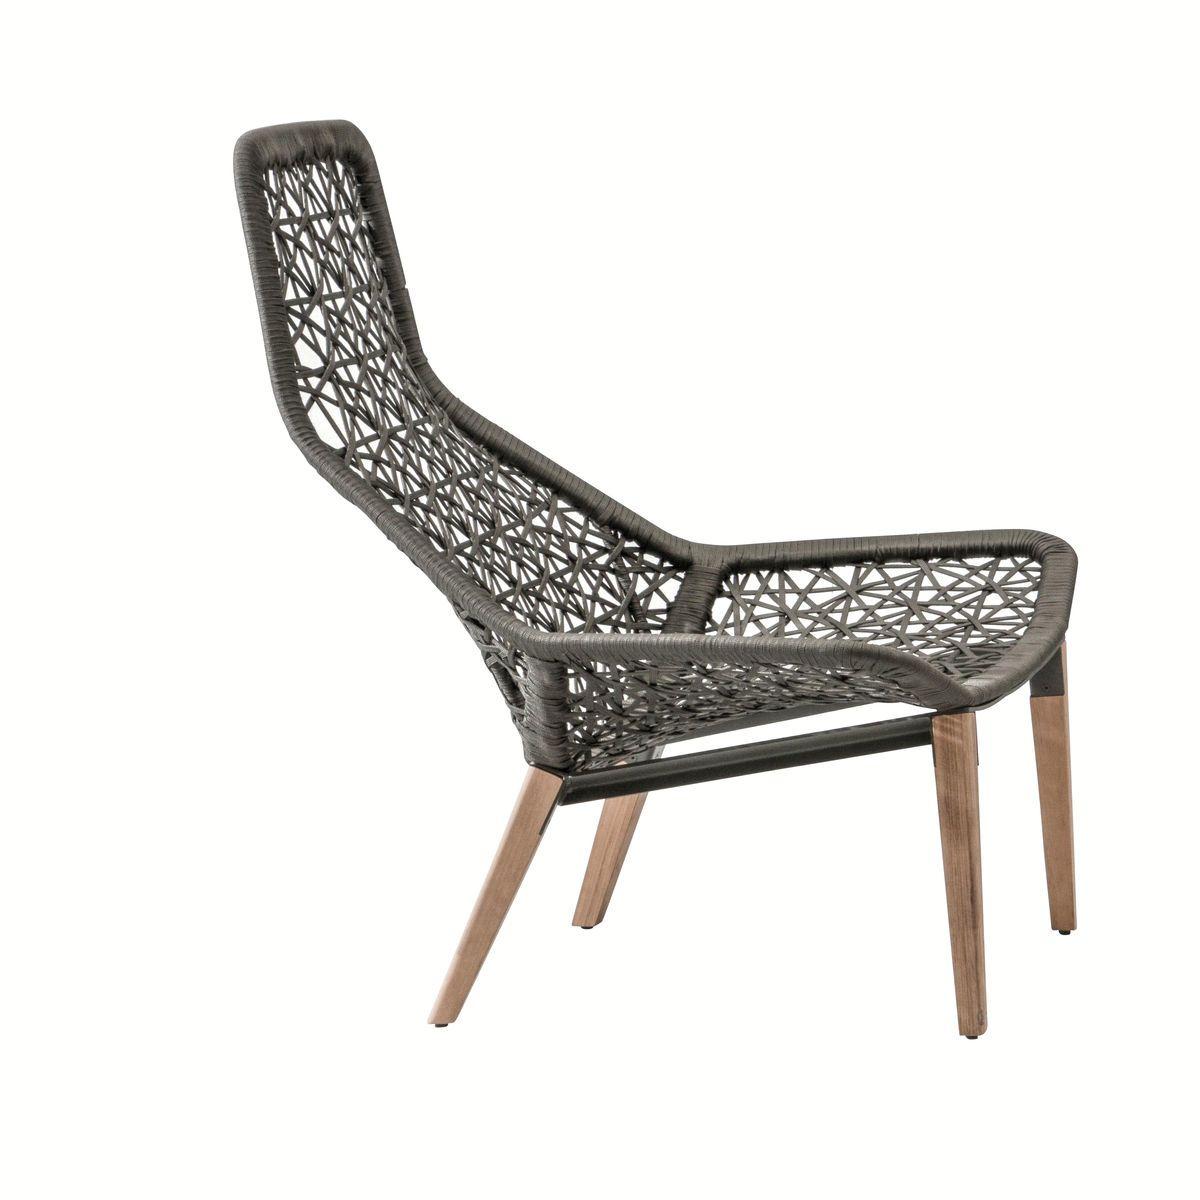 Maia relax gartensessel mit holzgestell kettal for Kettal maia chair